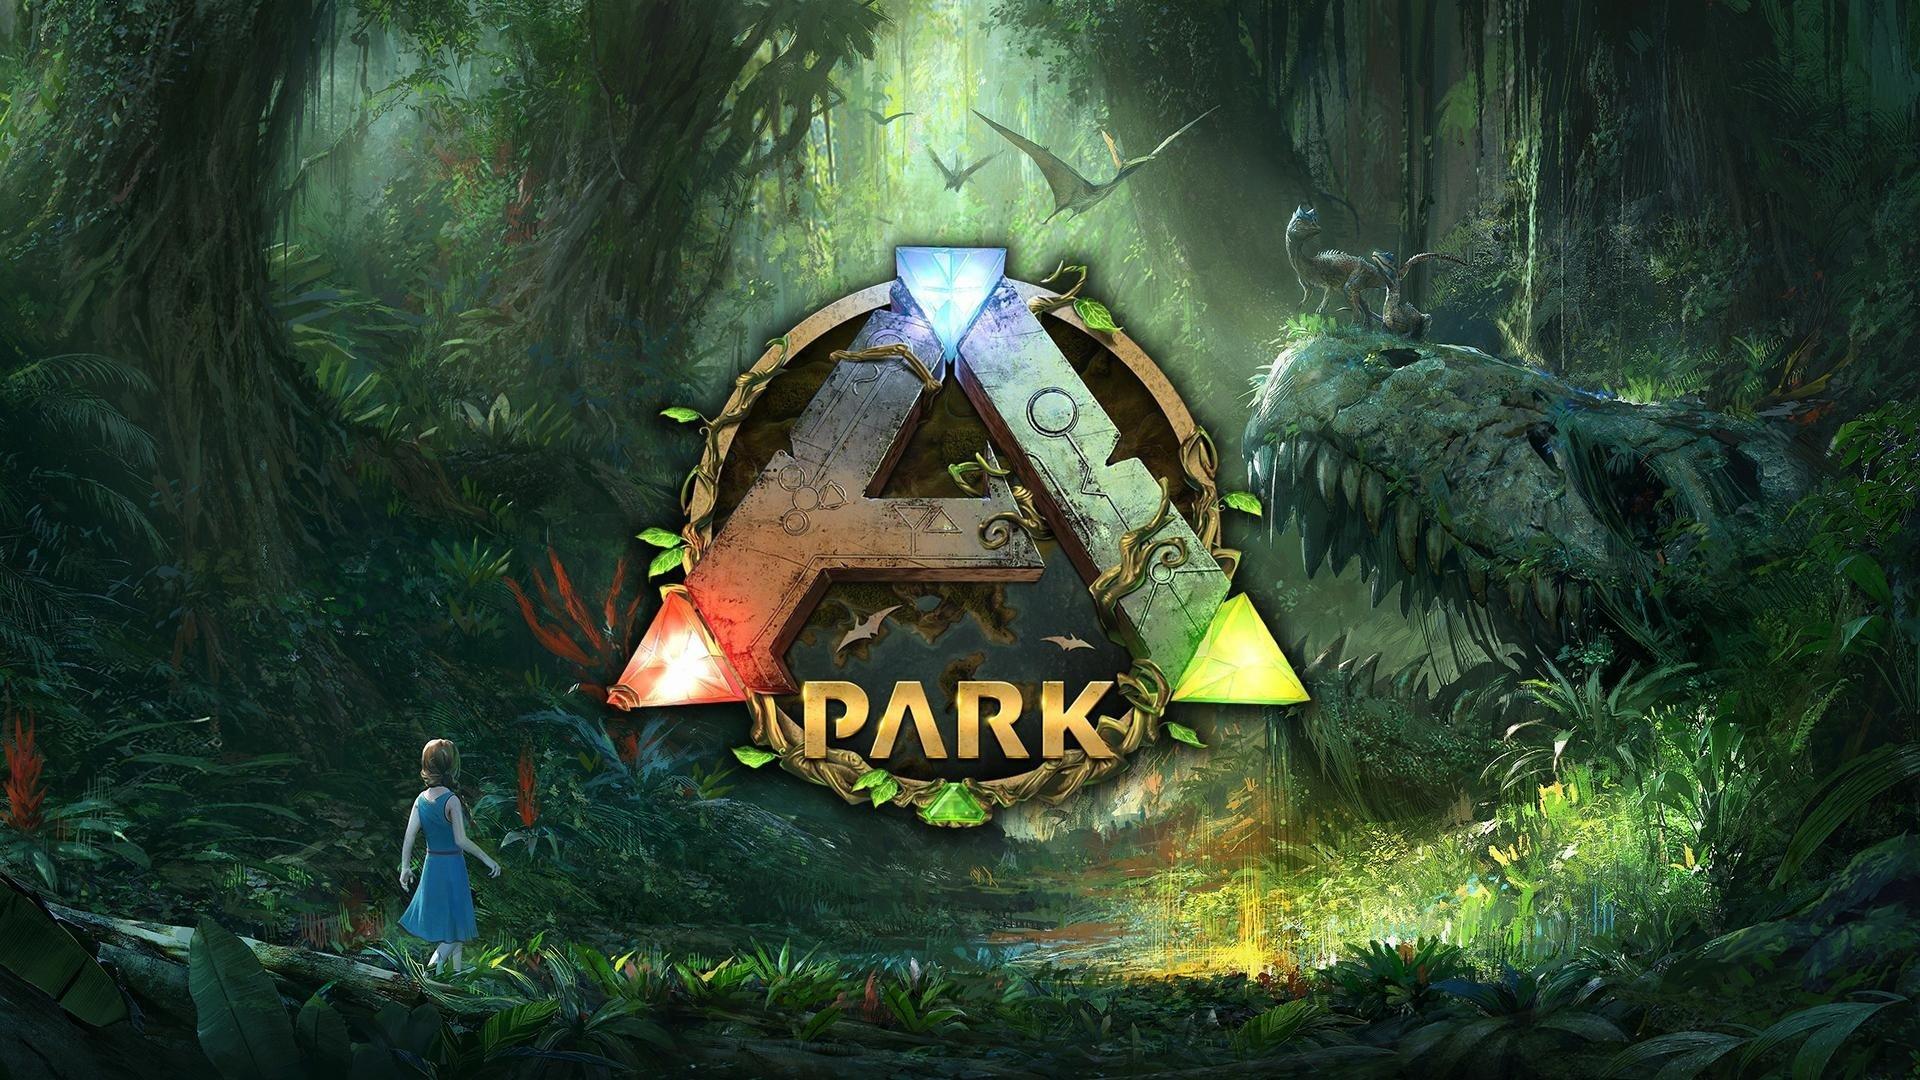 Ark Survival Evolved Hd Wallpaper Background Image 1920x1080